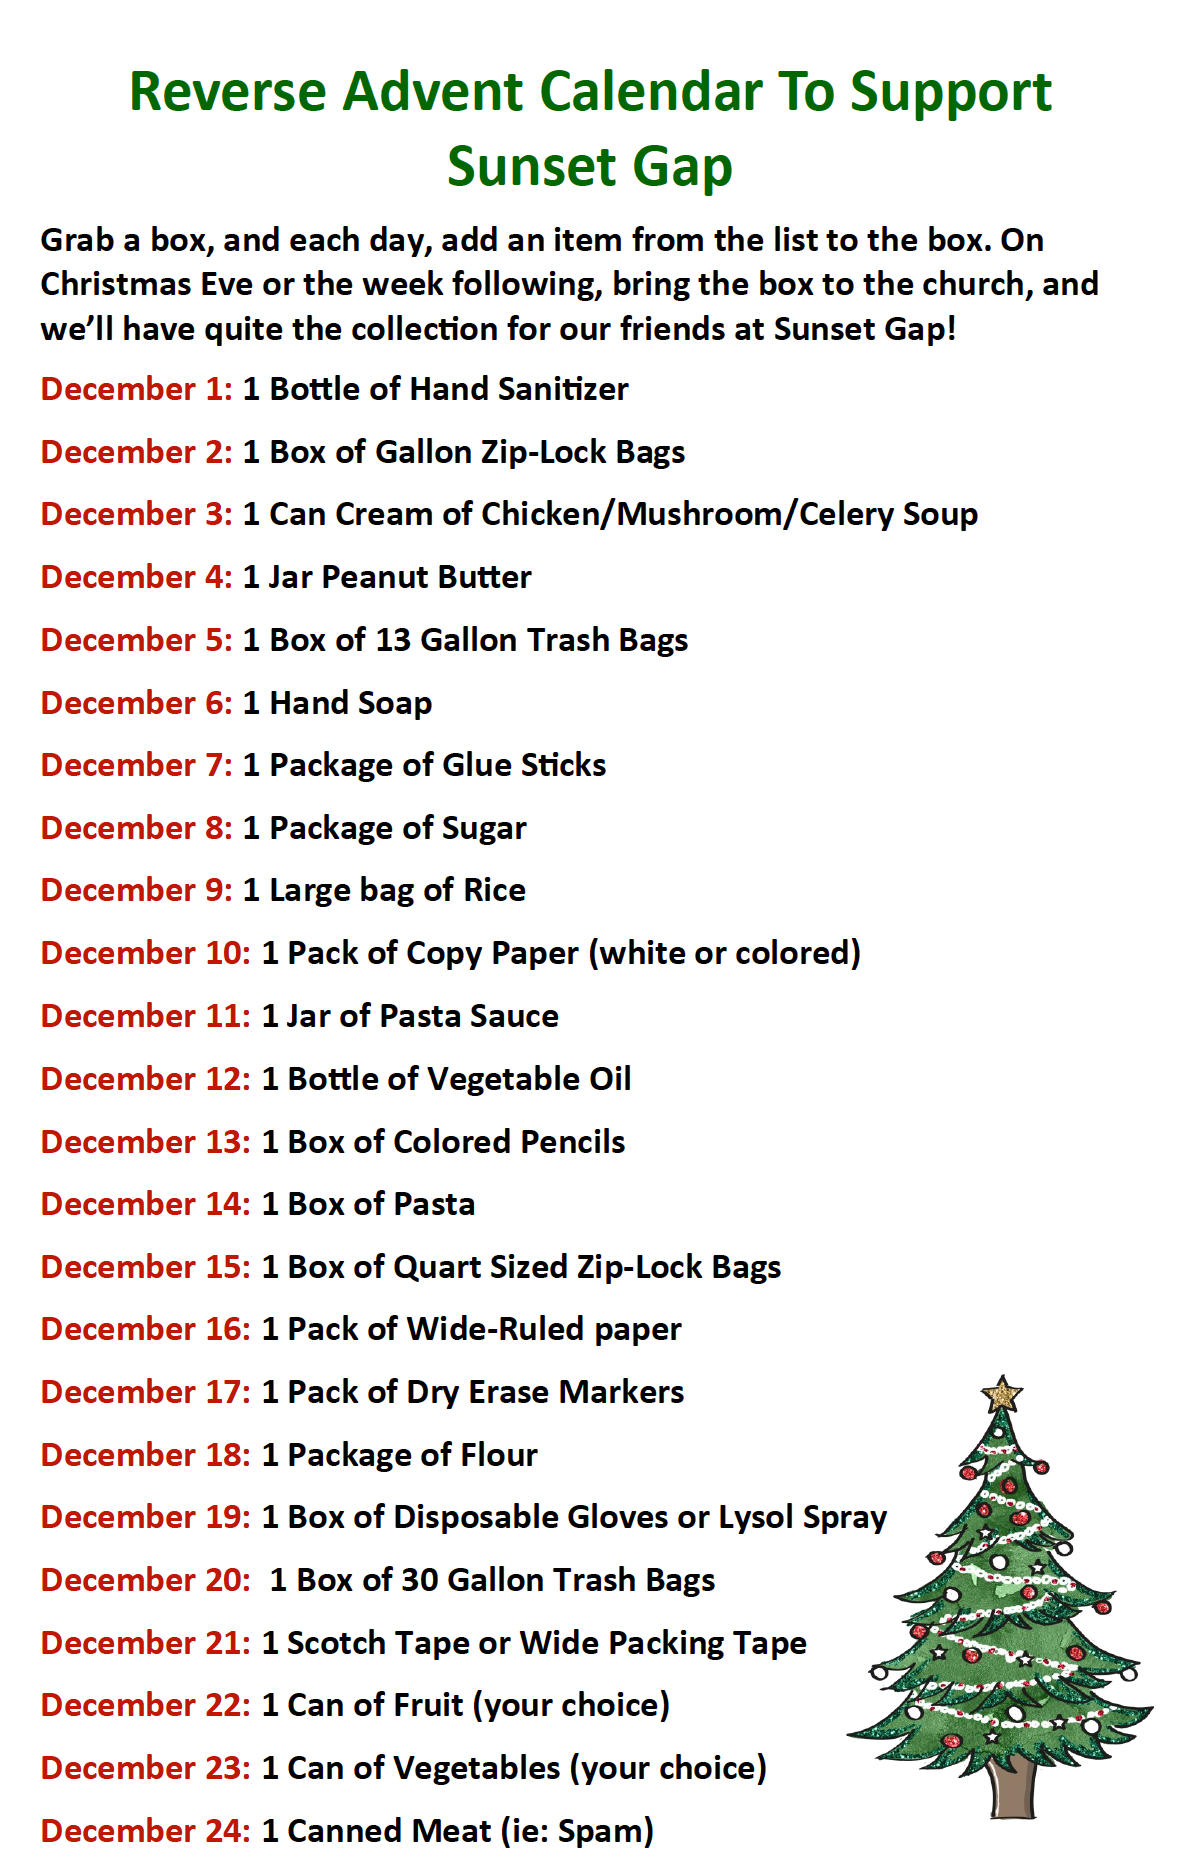 2020 Reverse Advent Calendar